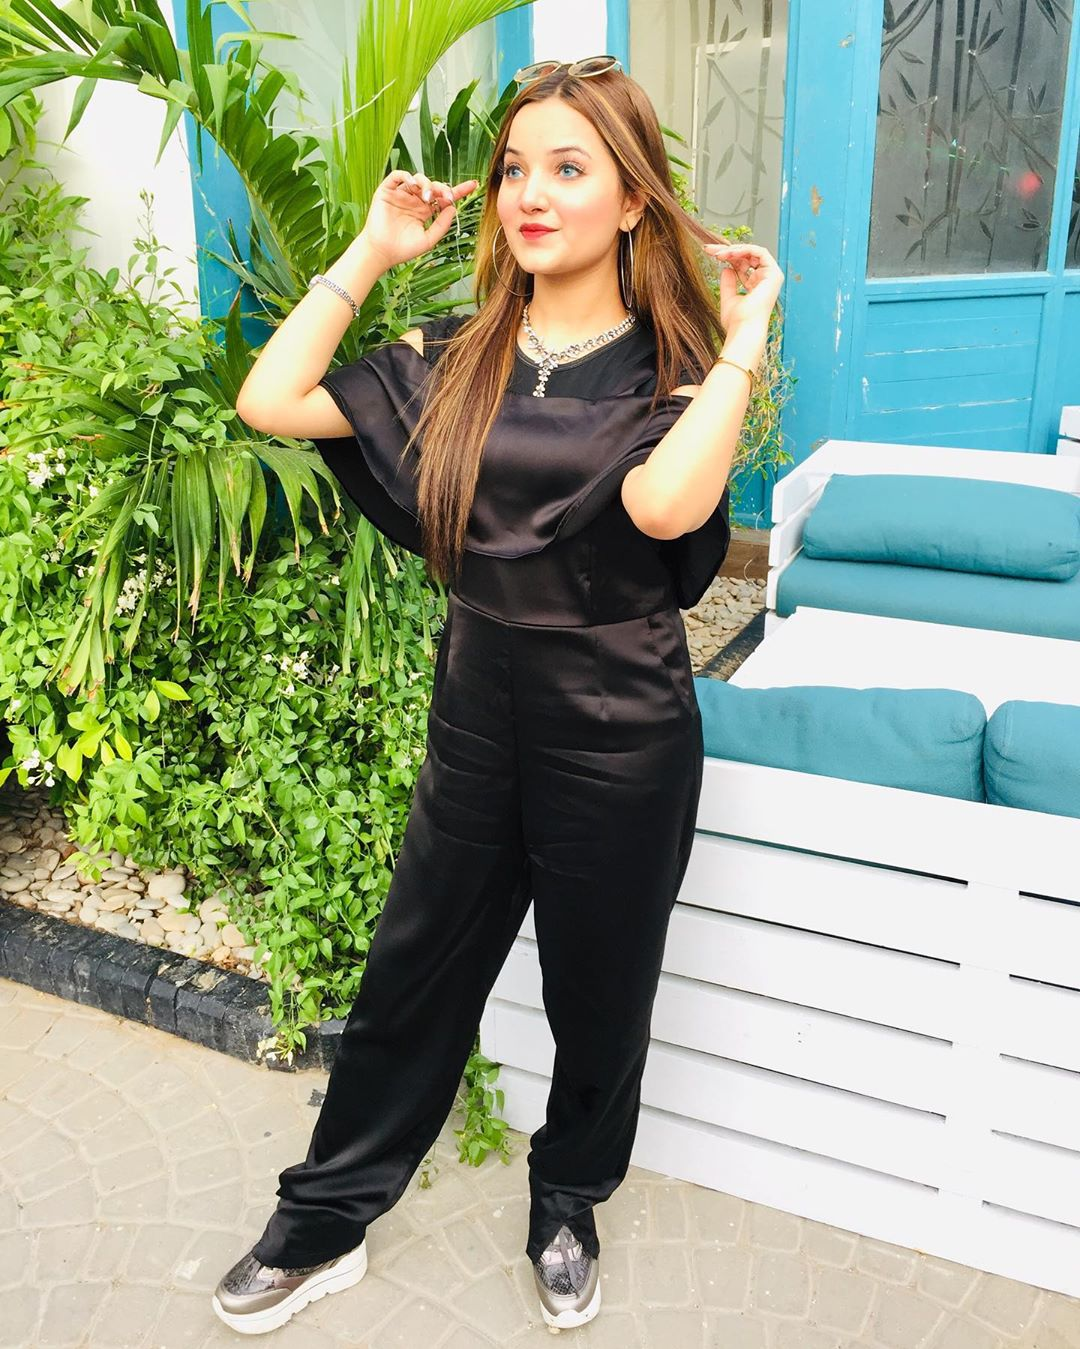 Rabeeca Khan Daughter of Actor Kashif Khan Beautiful Pictures